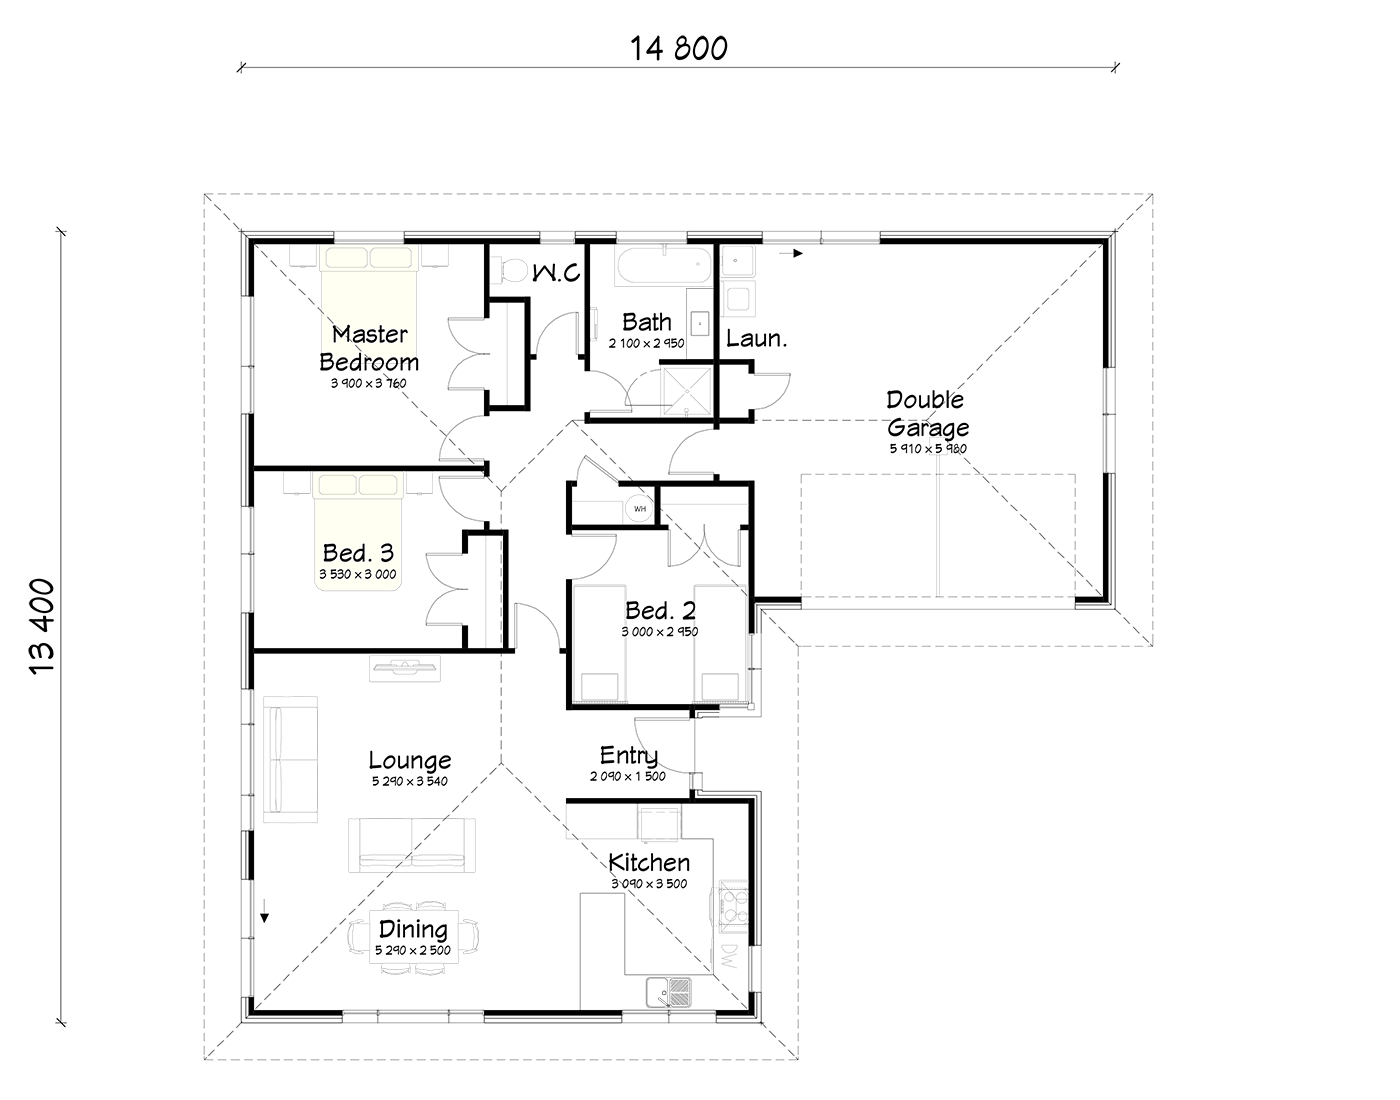 FH155 floor plan